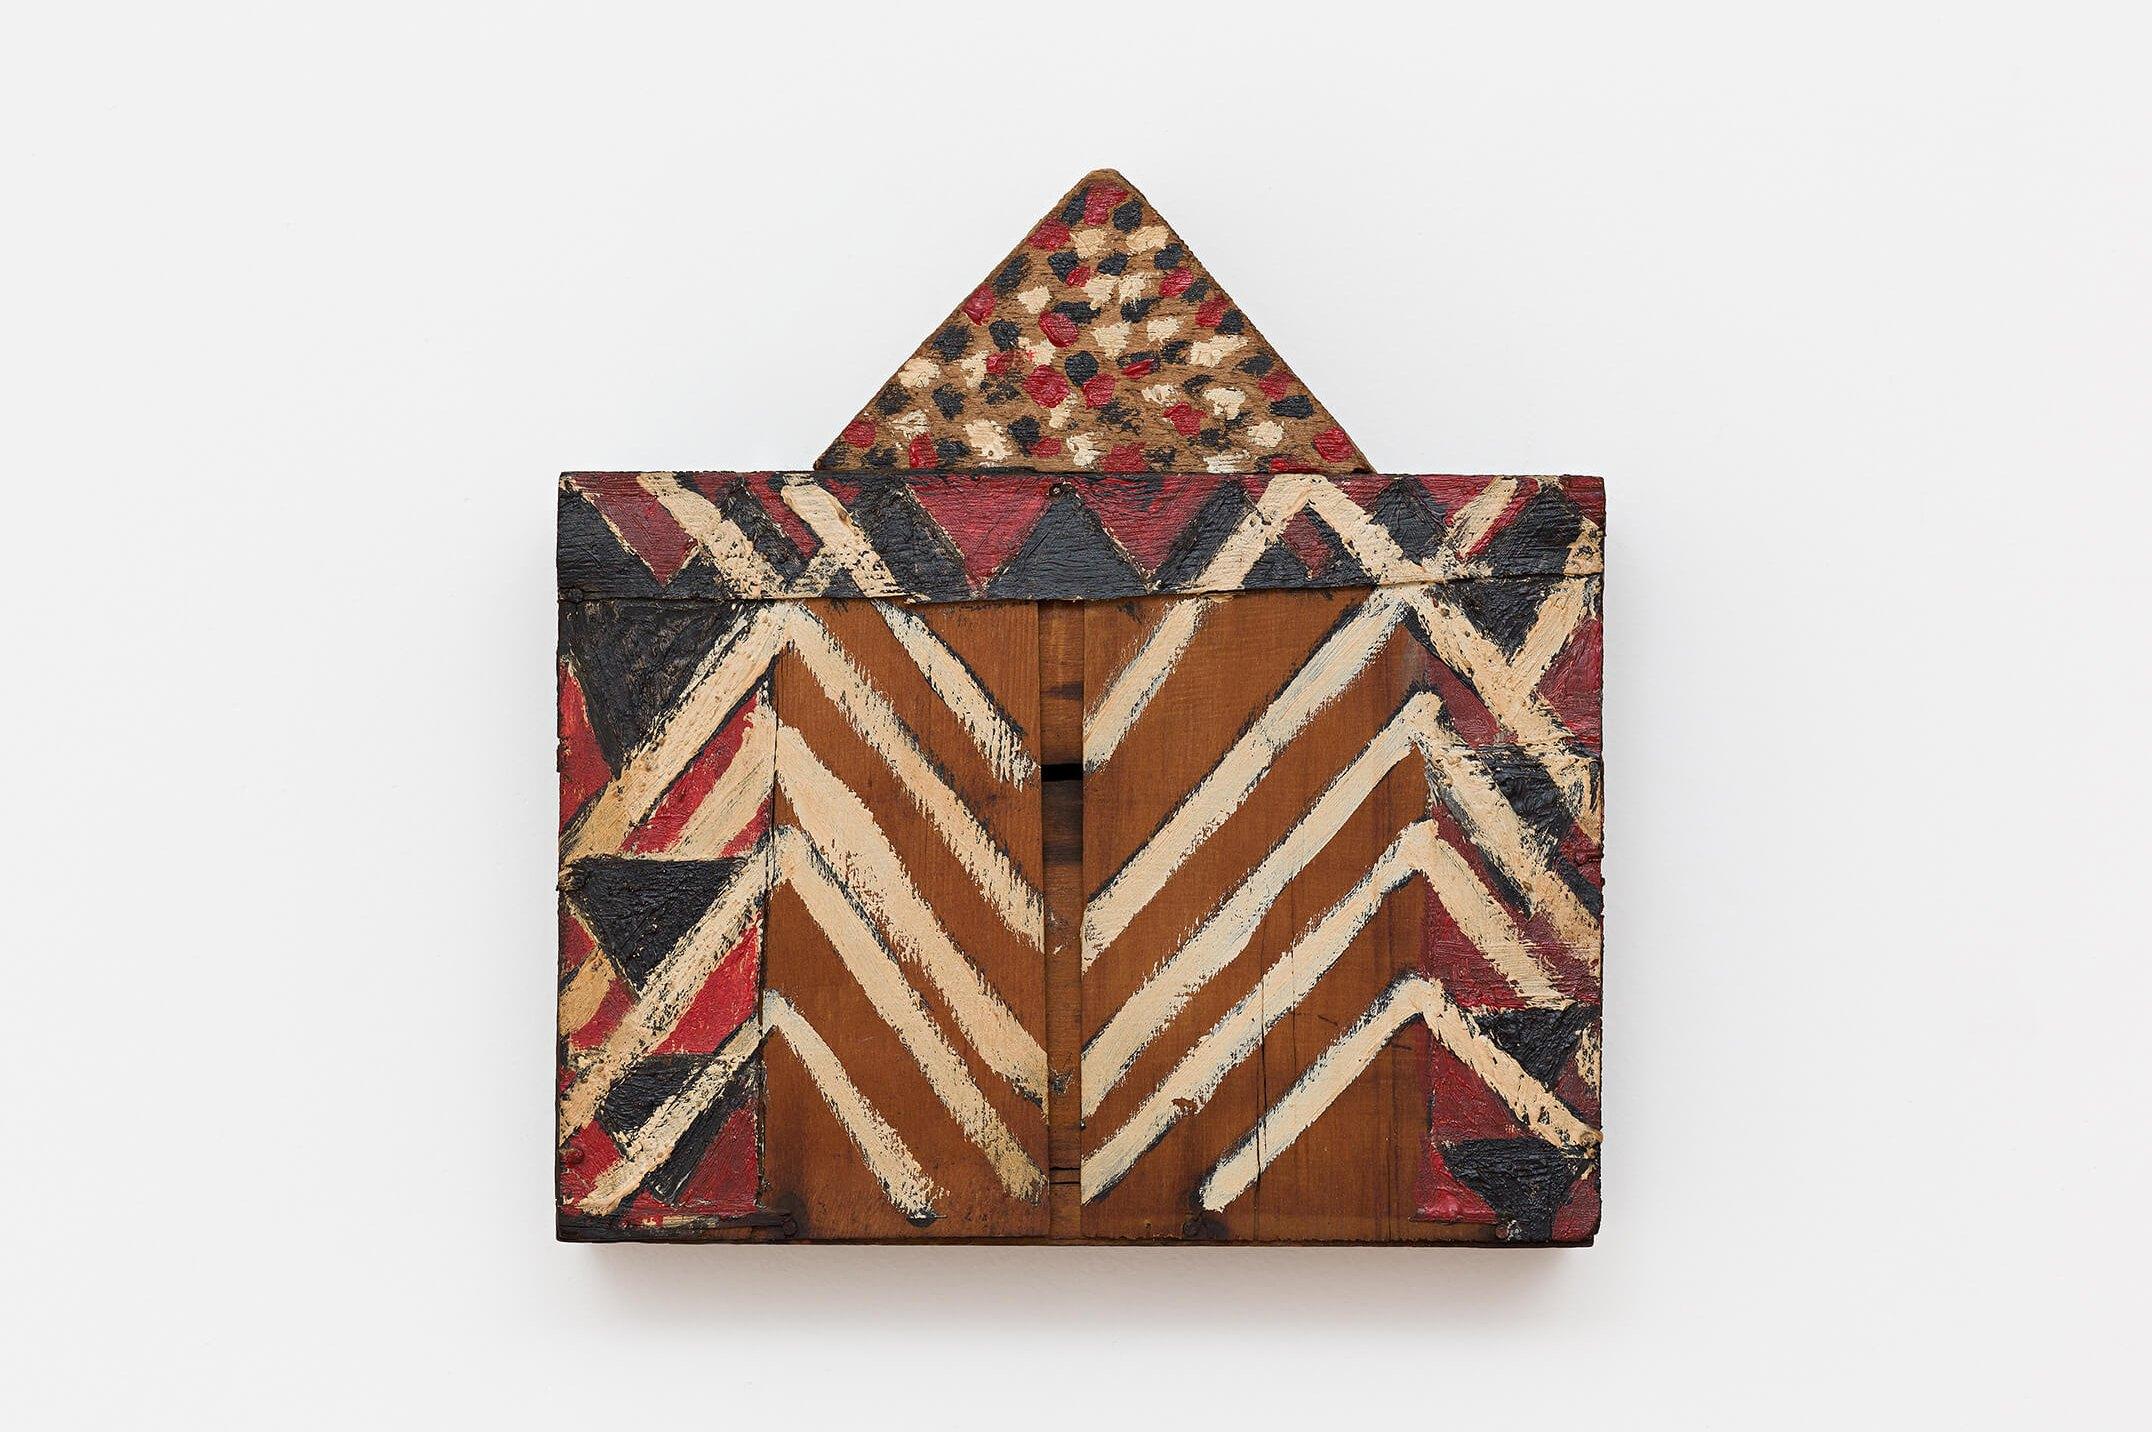 Celso Renato,&nbsp;<em>untitled</em>, 1992,&nbsp;acrylic on wood,&nbsp;22,5 × 22&nbsp;×&nbsp;5 cm - Mendes Wood DM